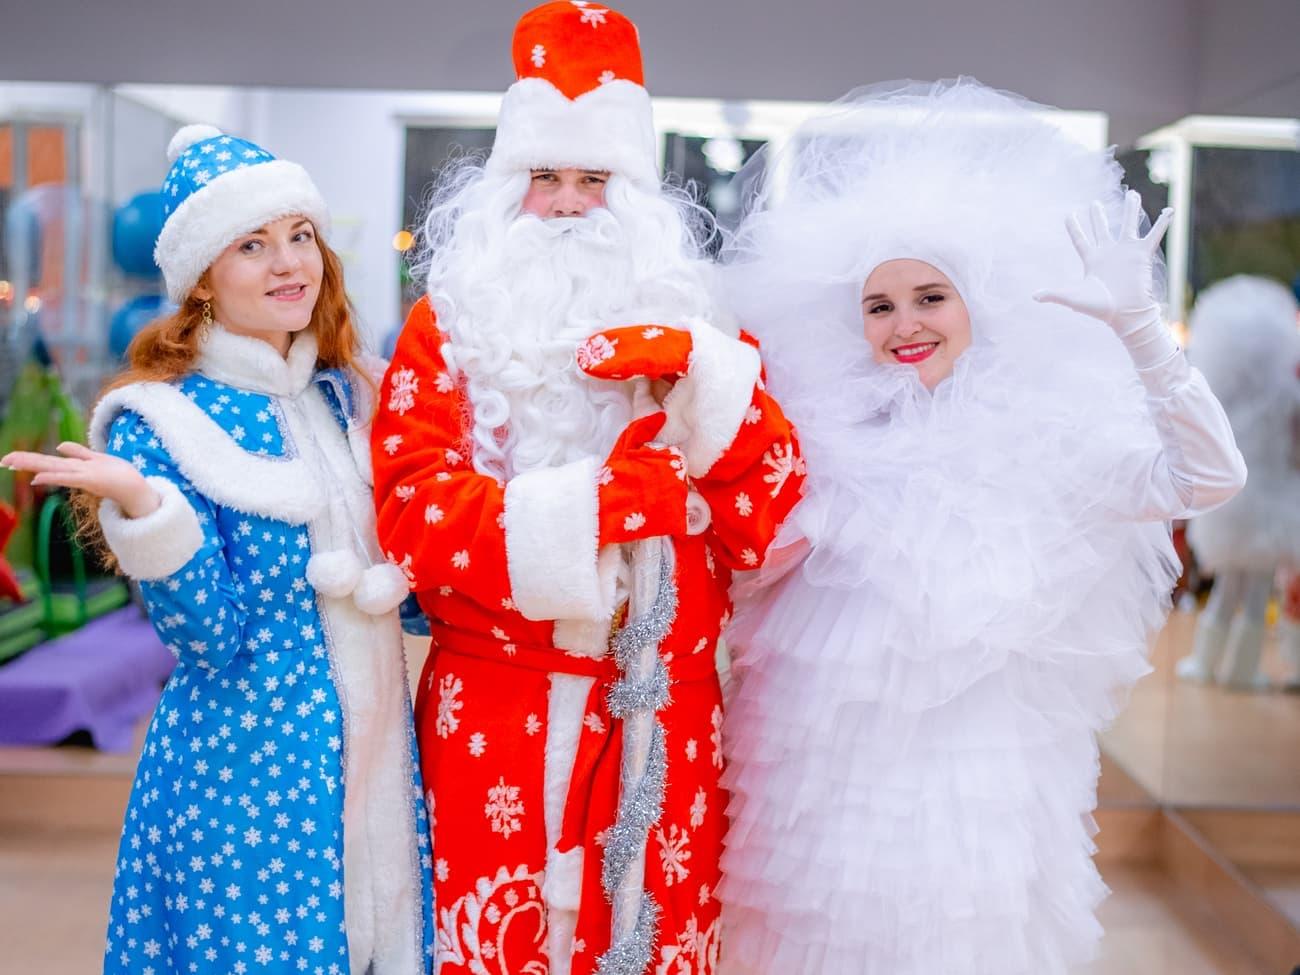 Дед Мороз, Снегурочка и Фьек